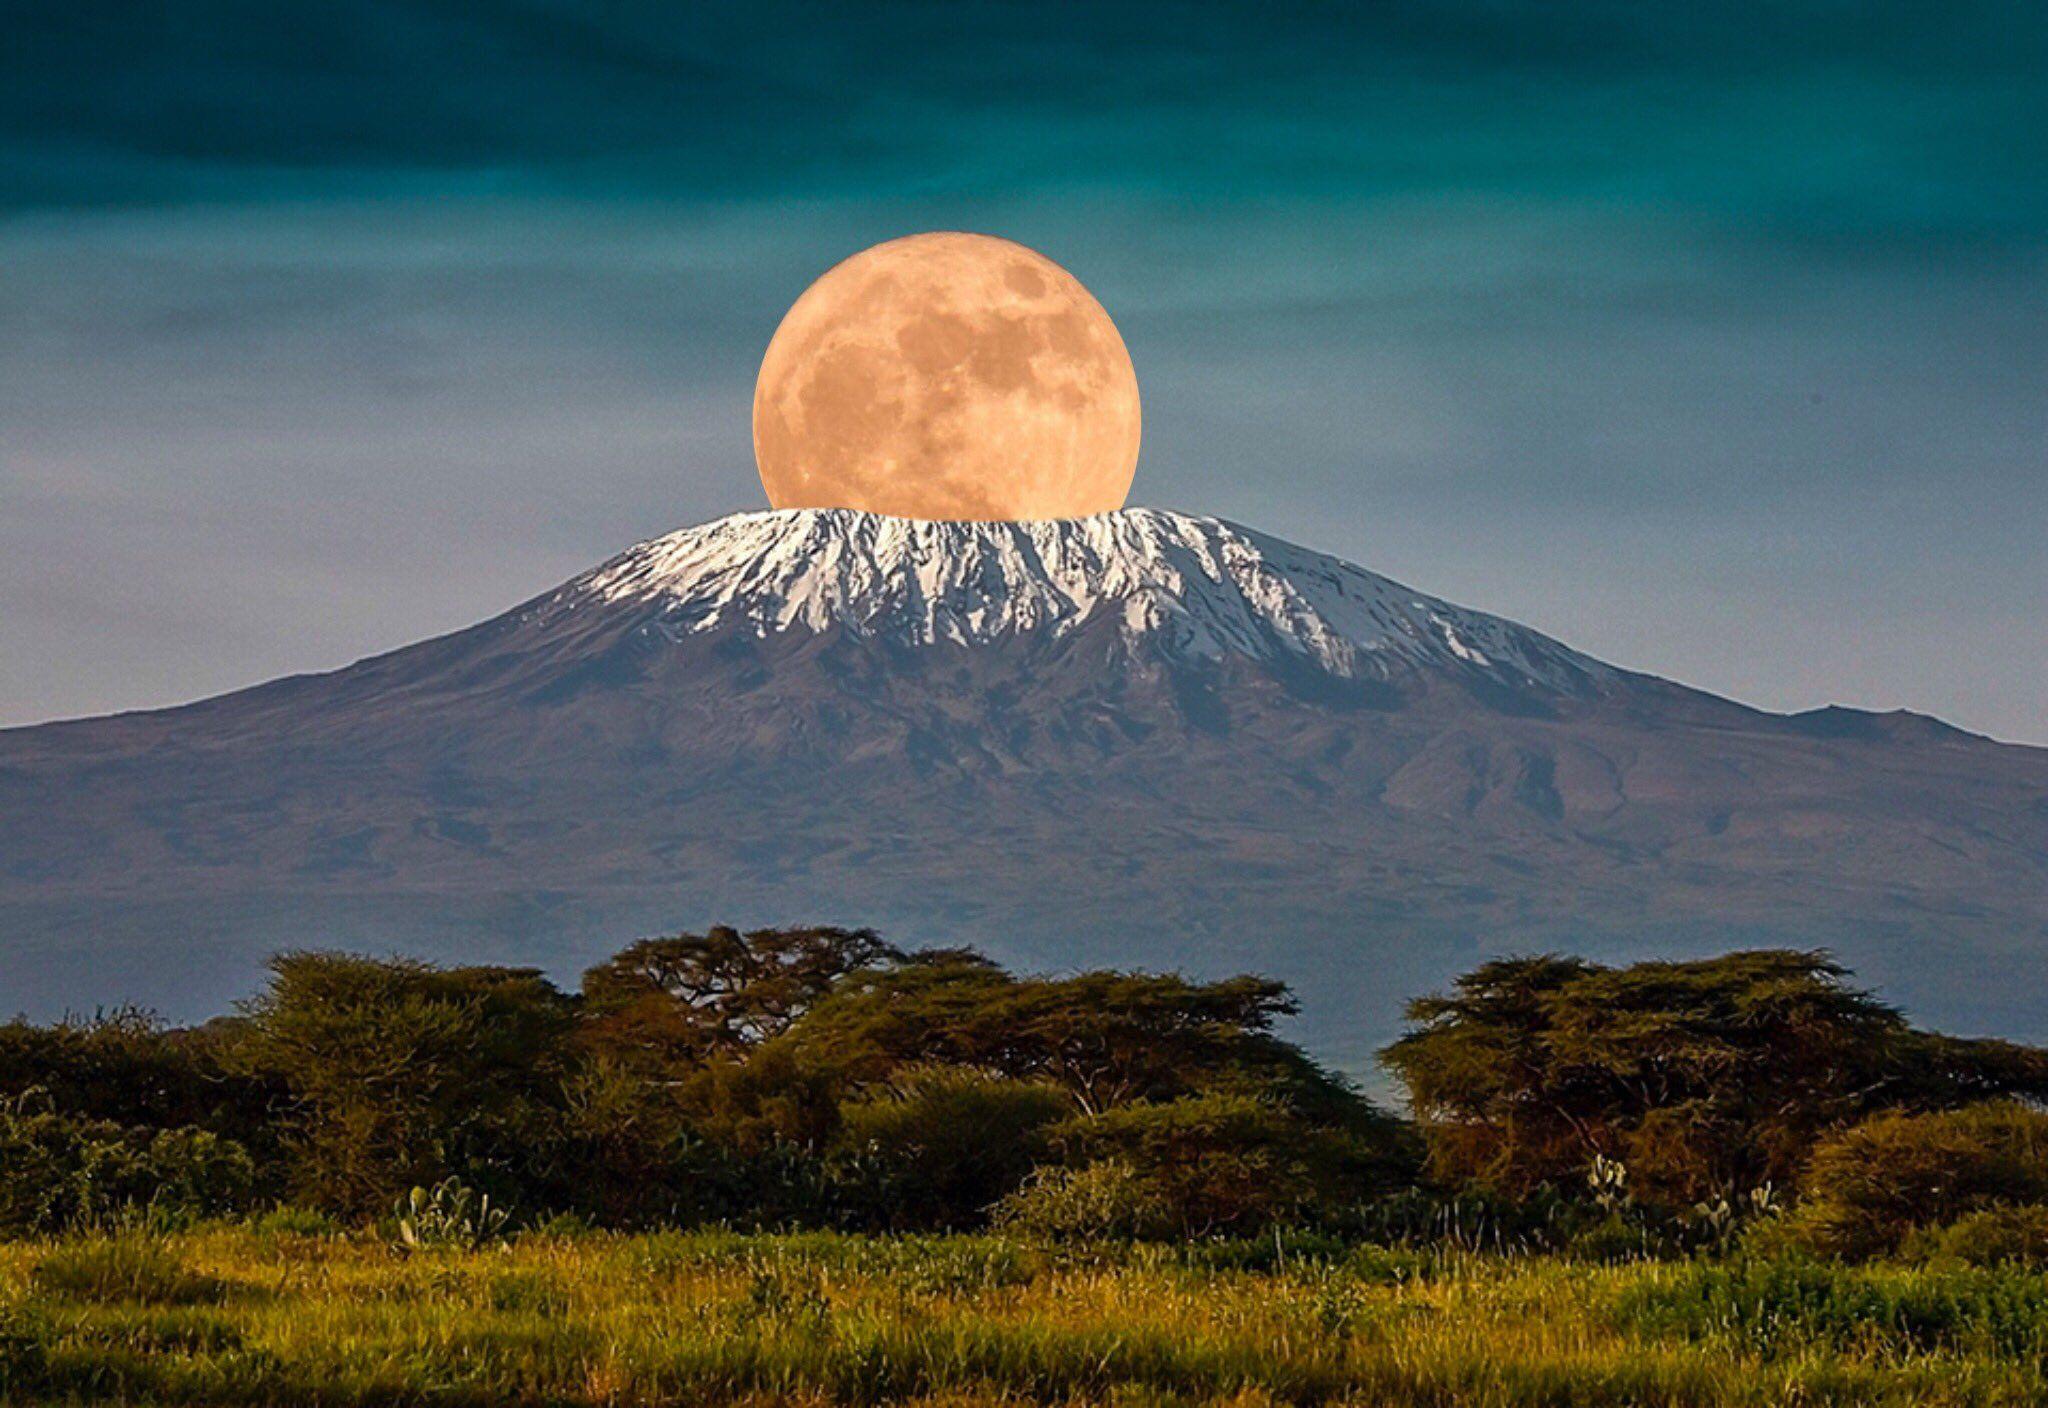 The full moon rises over Mount Kilimanjaro, Tanzania, Africa